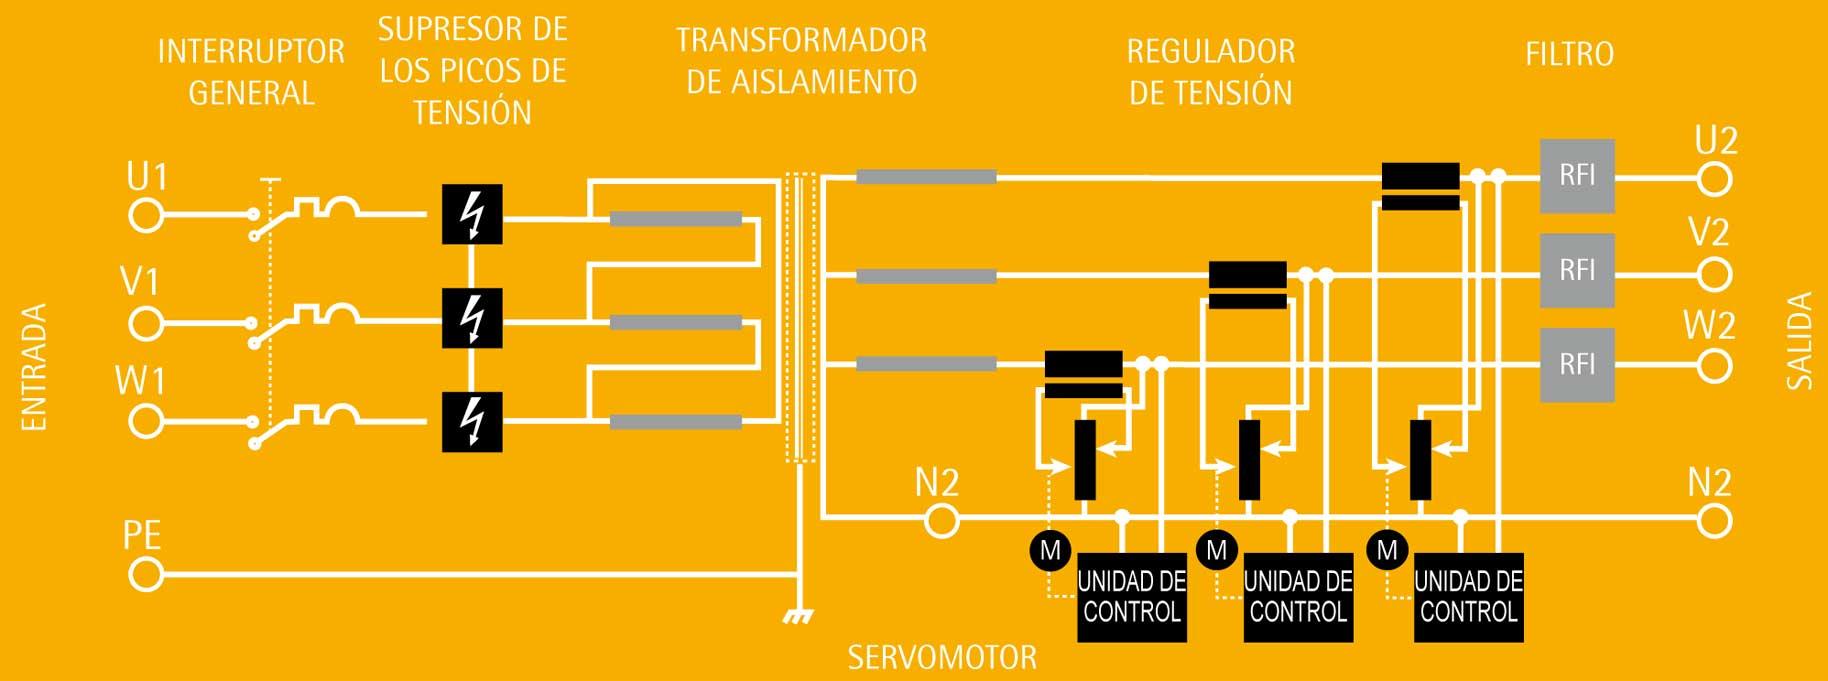 ACONDICIONADORES ELECTRODINÁMICOS STEROGUARD - IREM